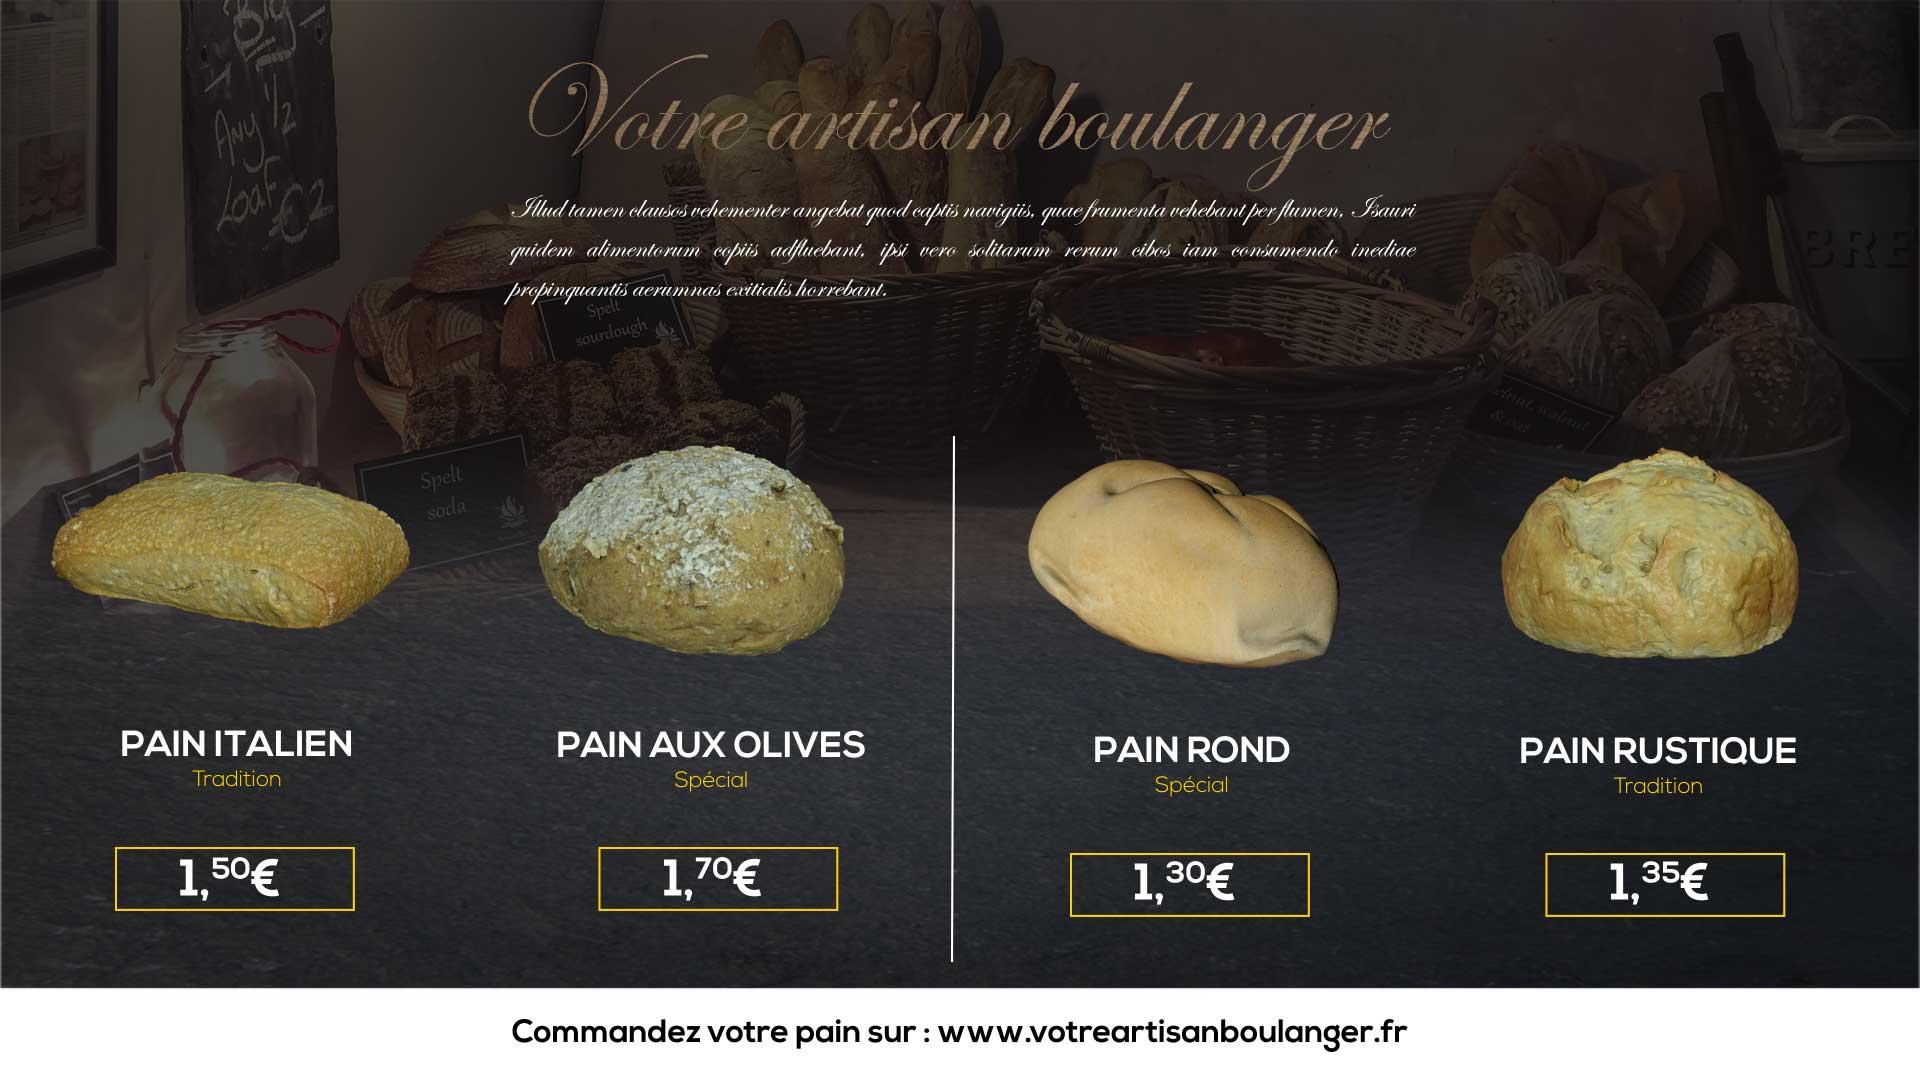 image 004t template votre artisan boulanger-min